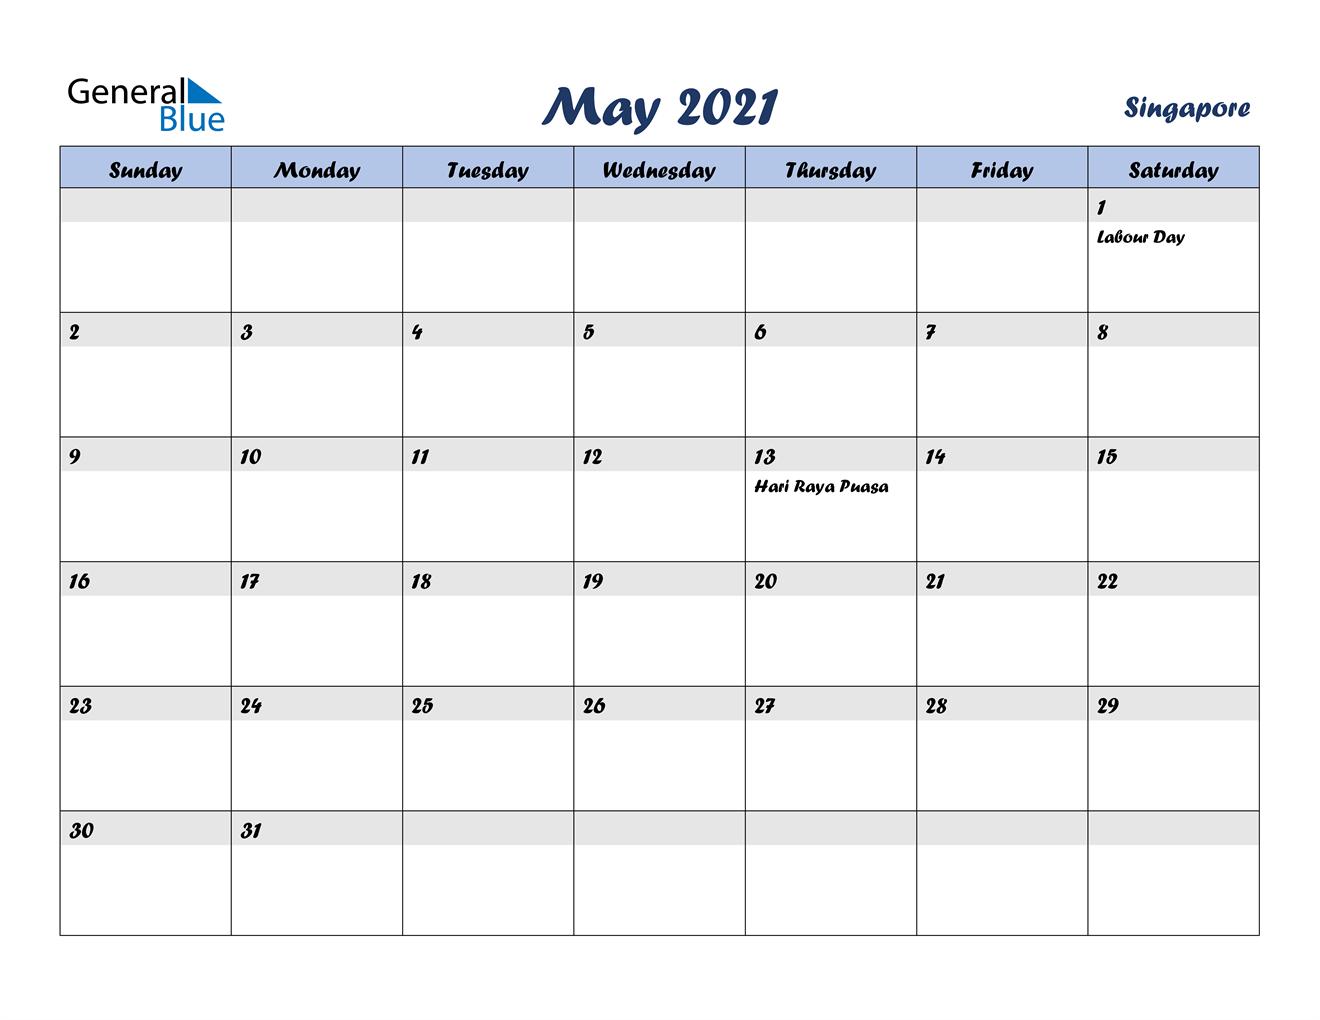 May 2021 Calendar - Singapore